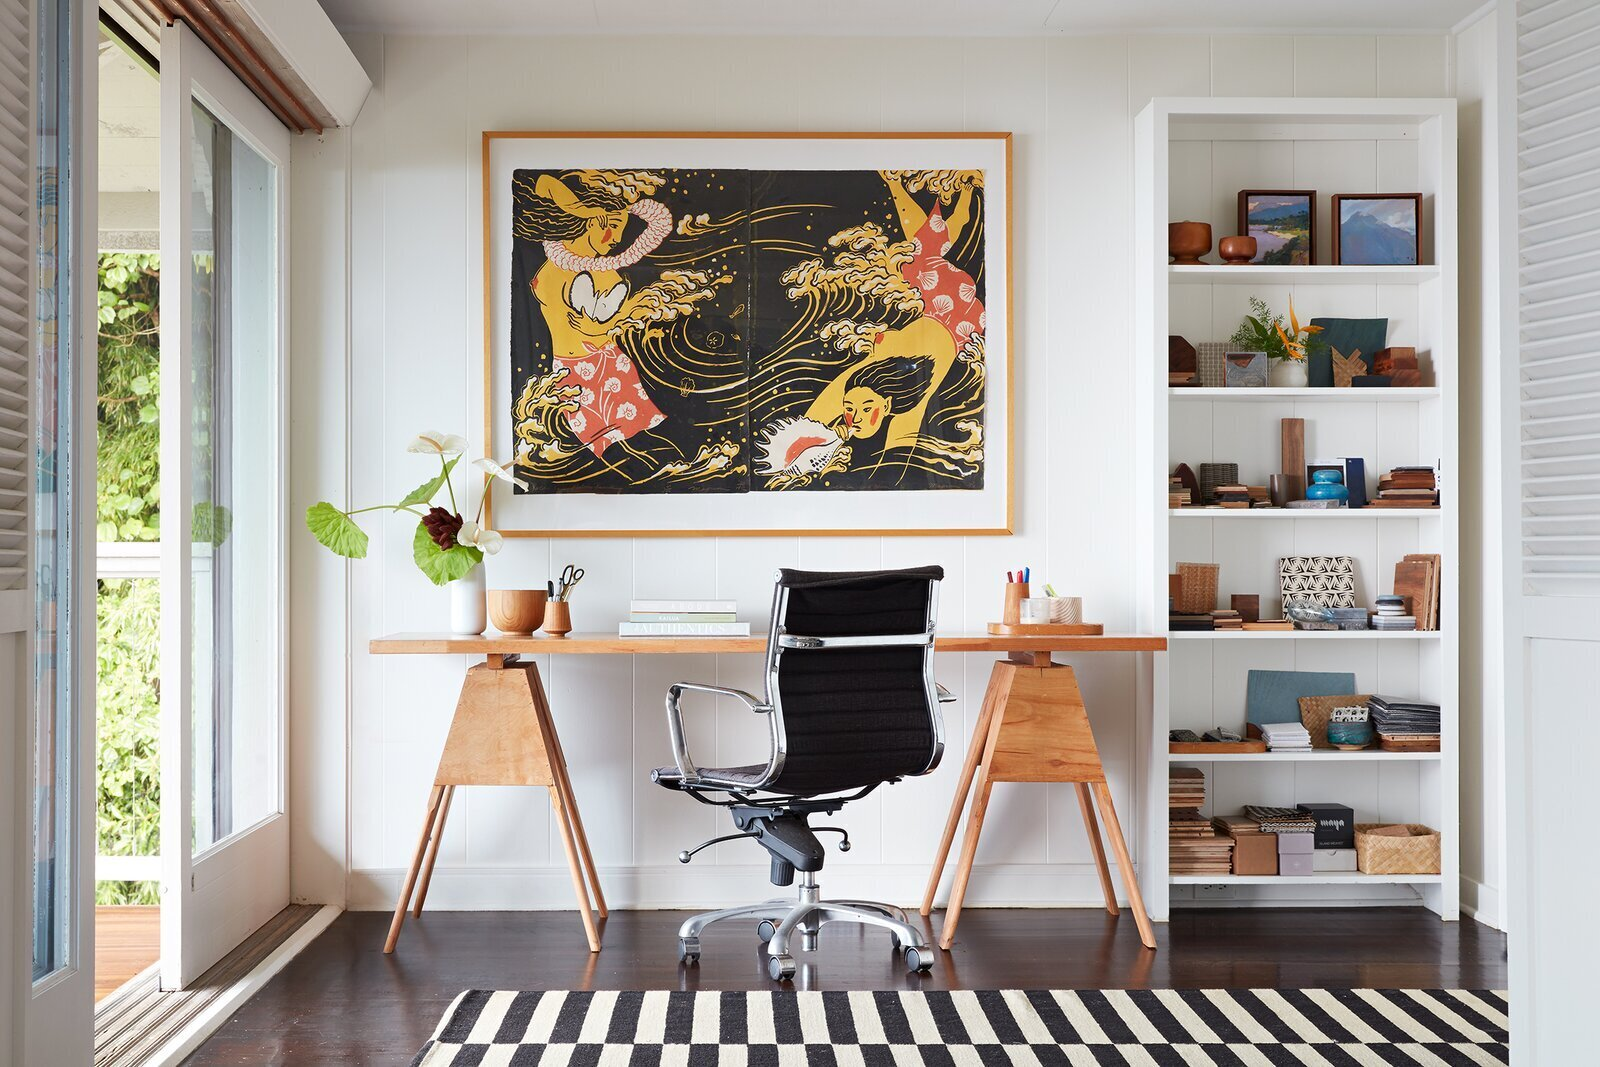 The Tantalus Studio office